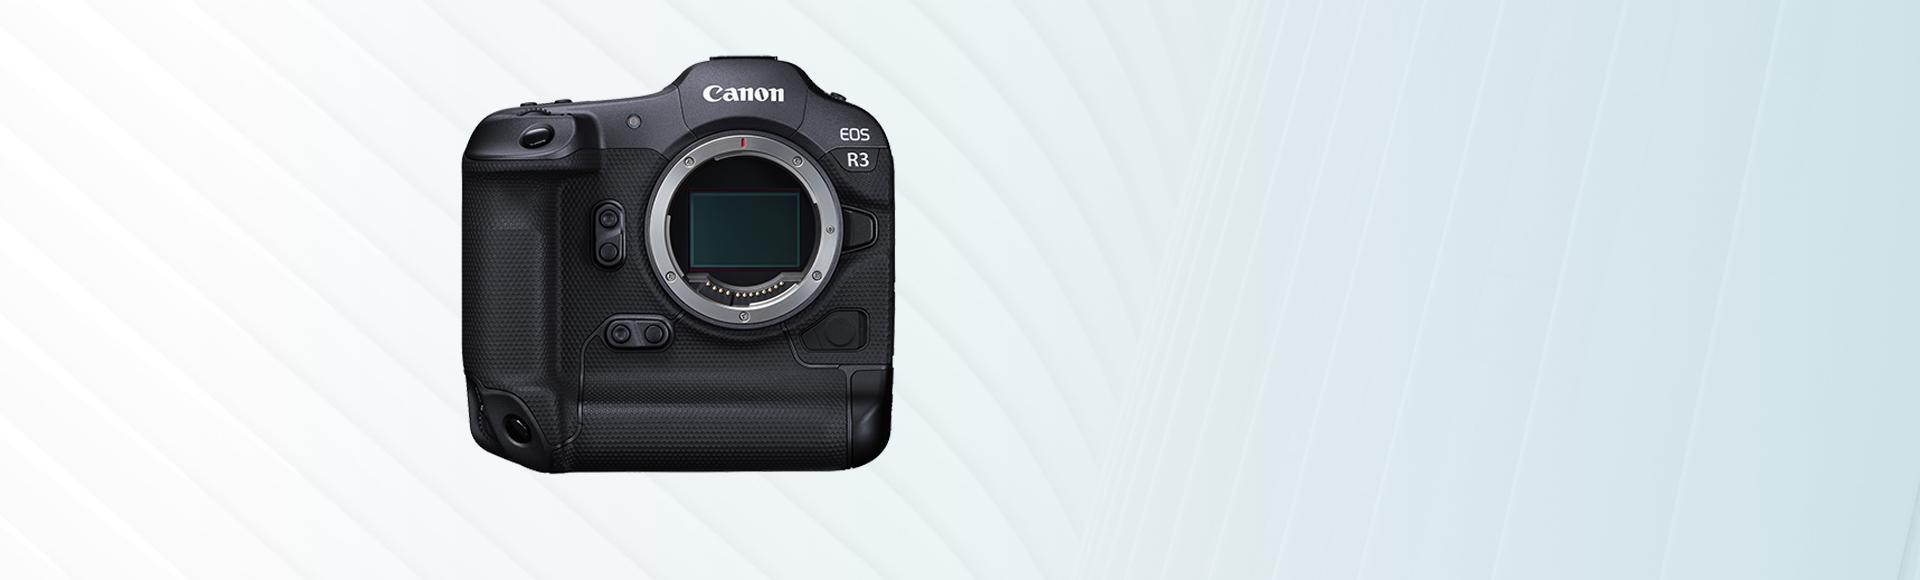 NEW Canon EOS R3